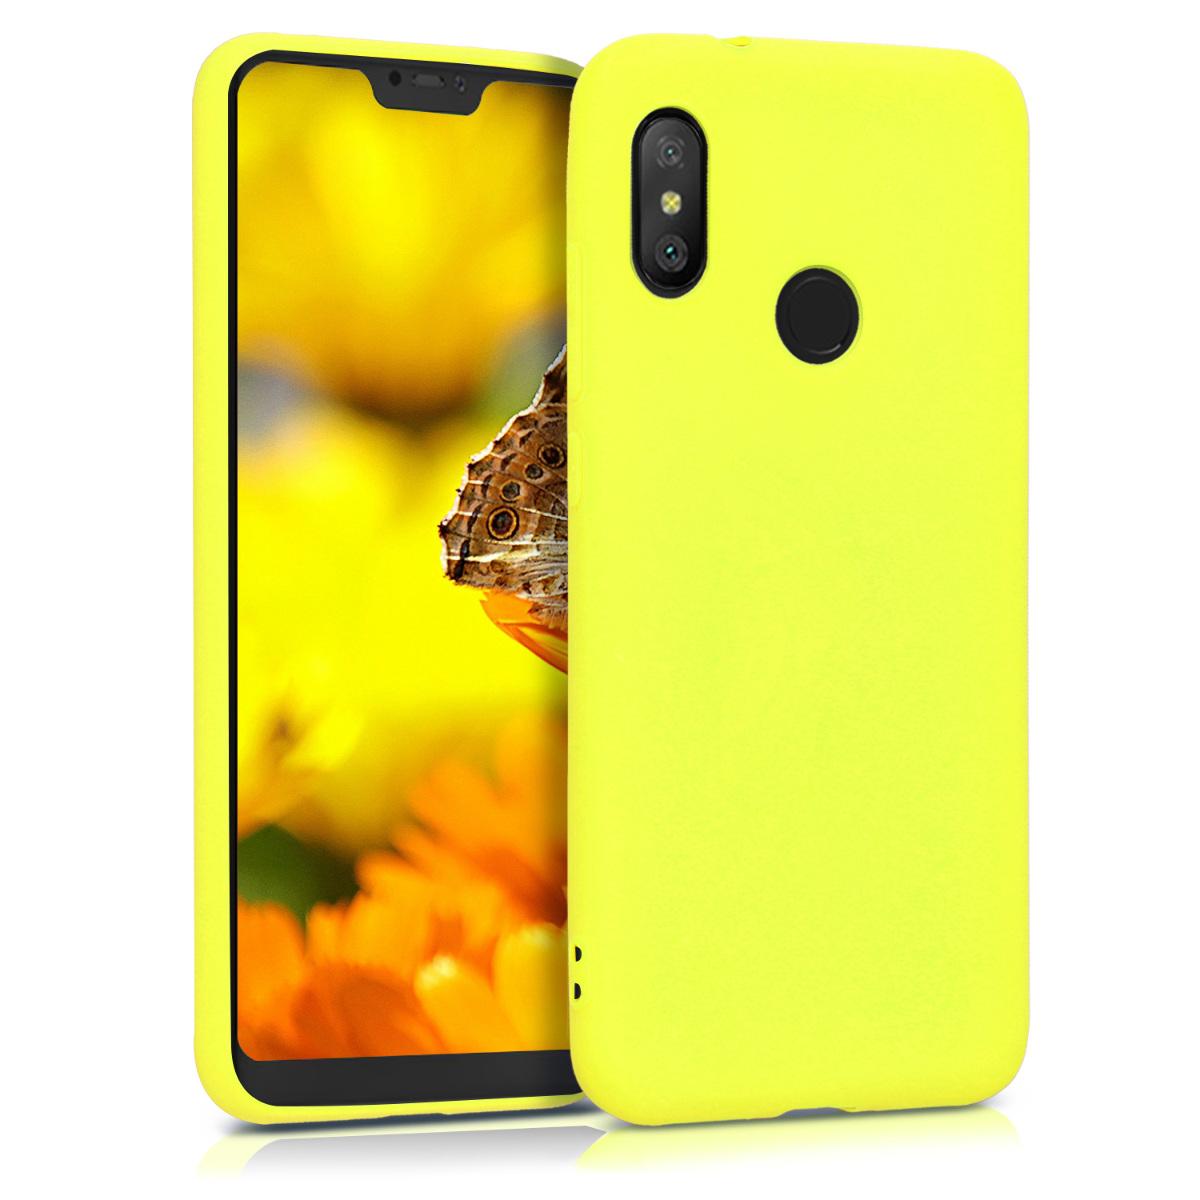 Kvalitní silikonové TPU pouzdro | obal pro Xiaomi Redmi 6 Pro | Mi A2 Lite - Lemon žluté